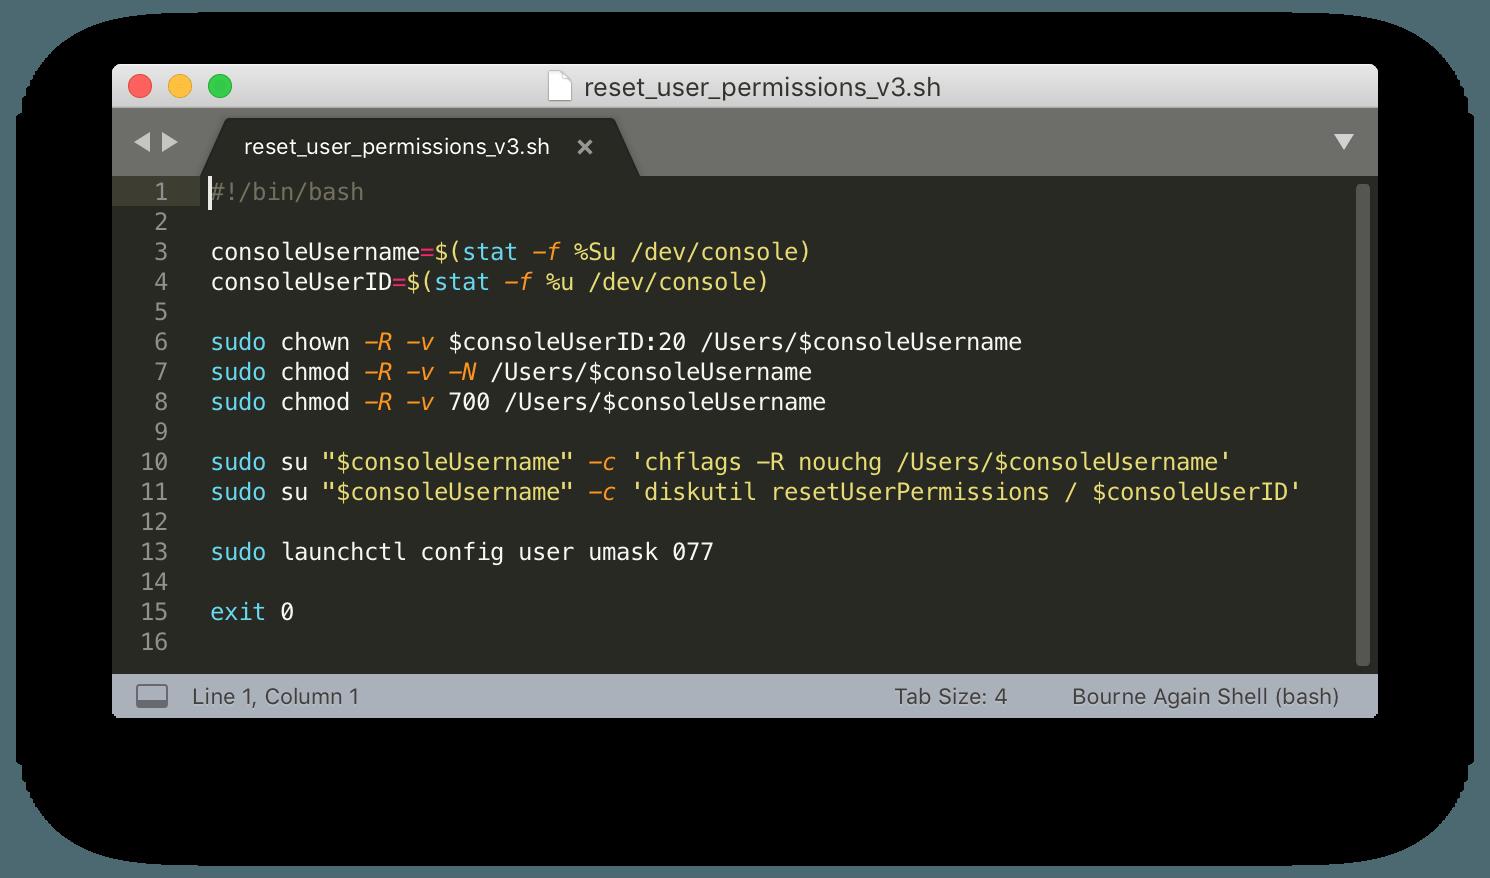 reset_user_permissions_v3